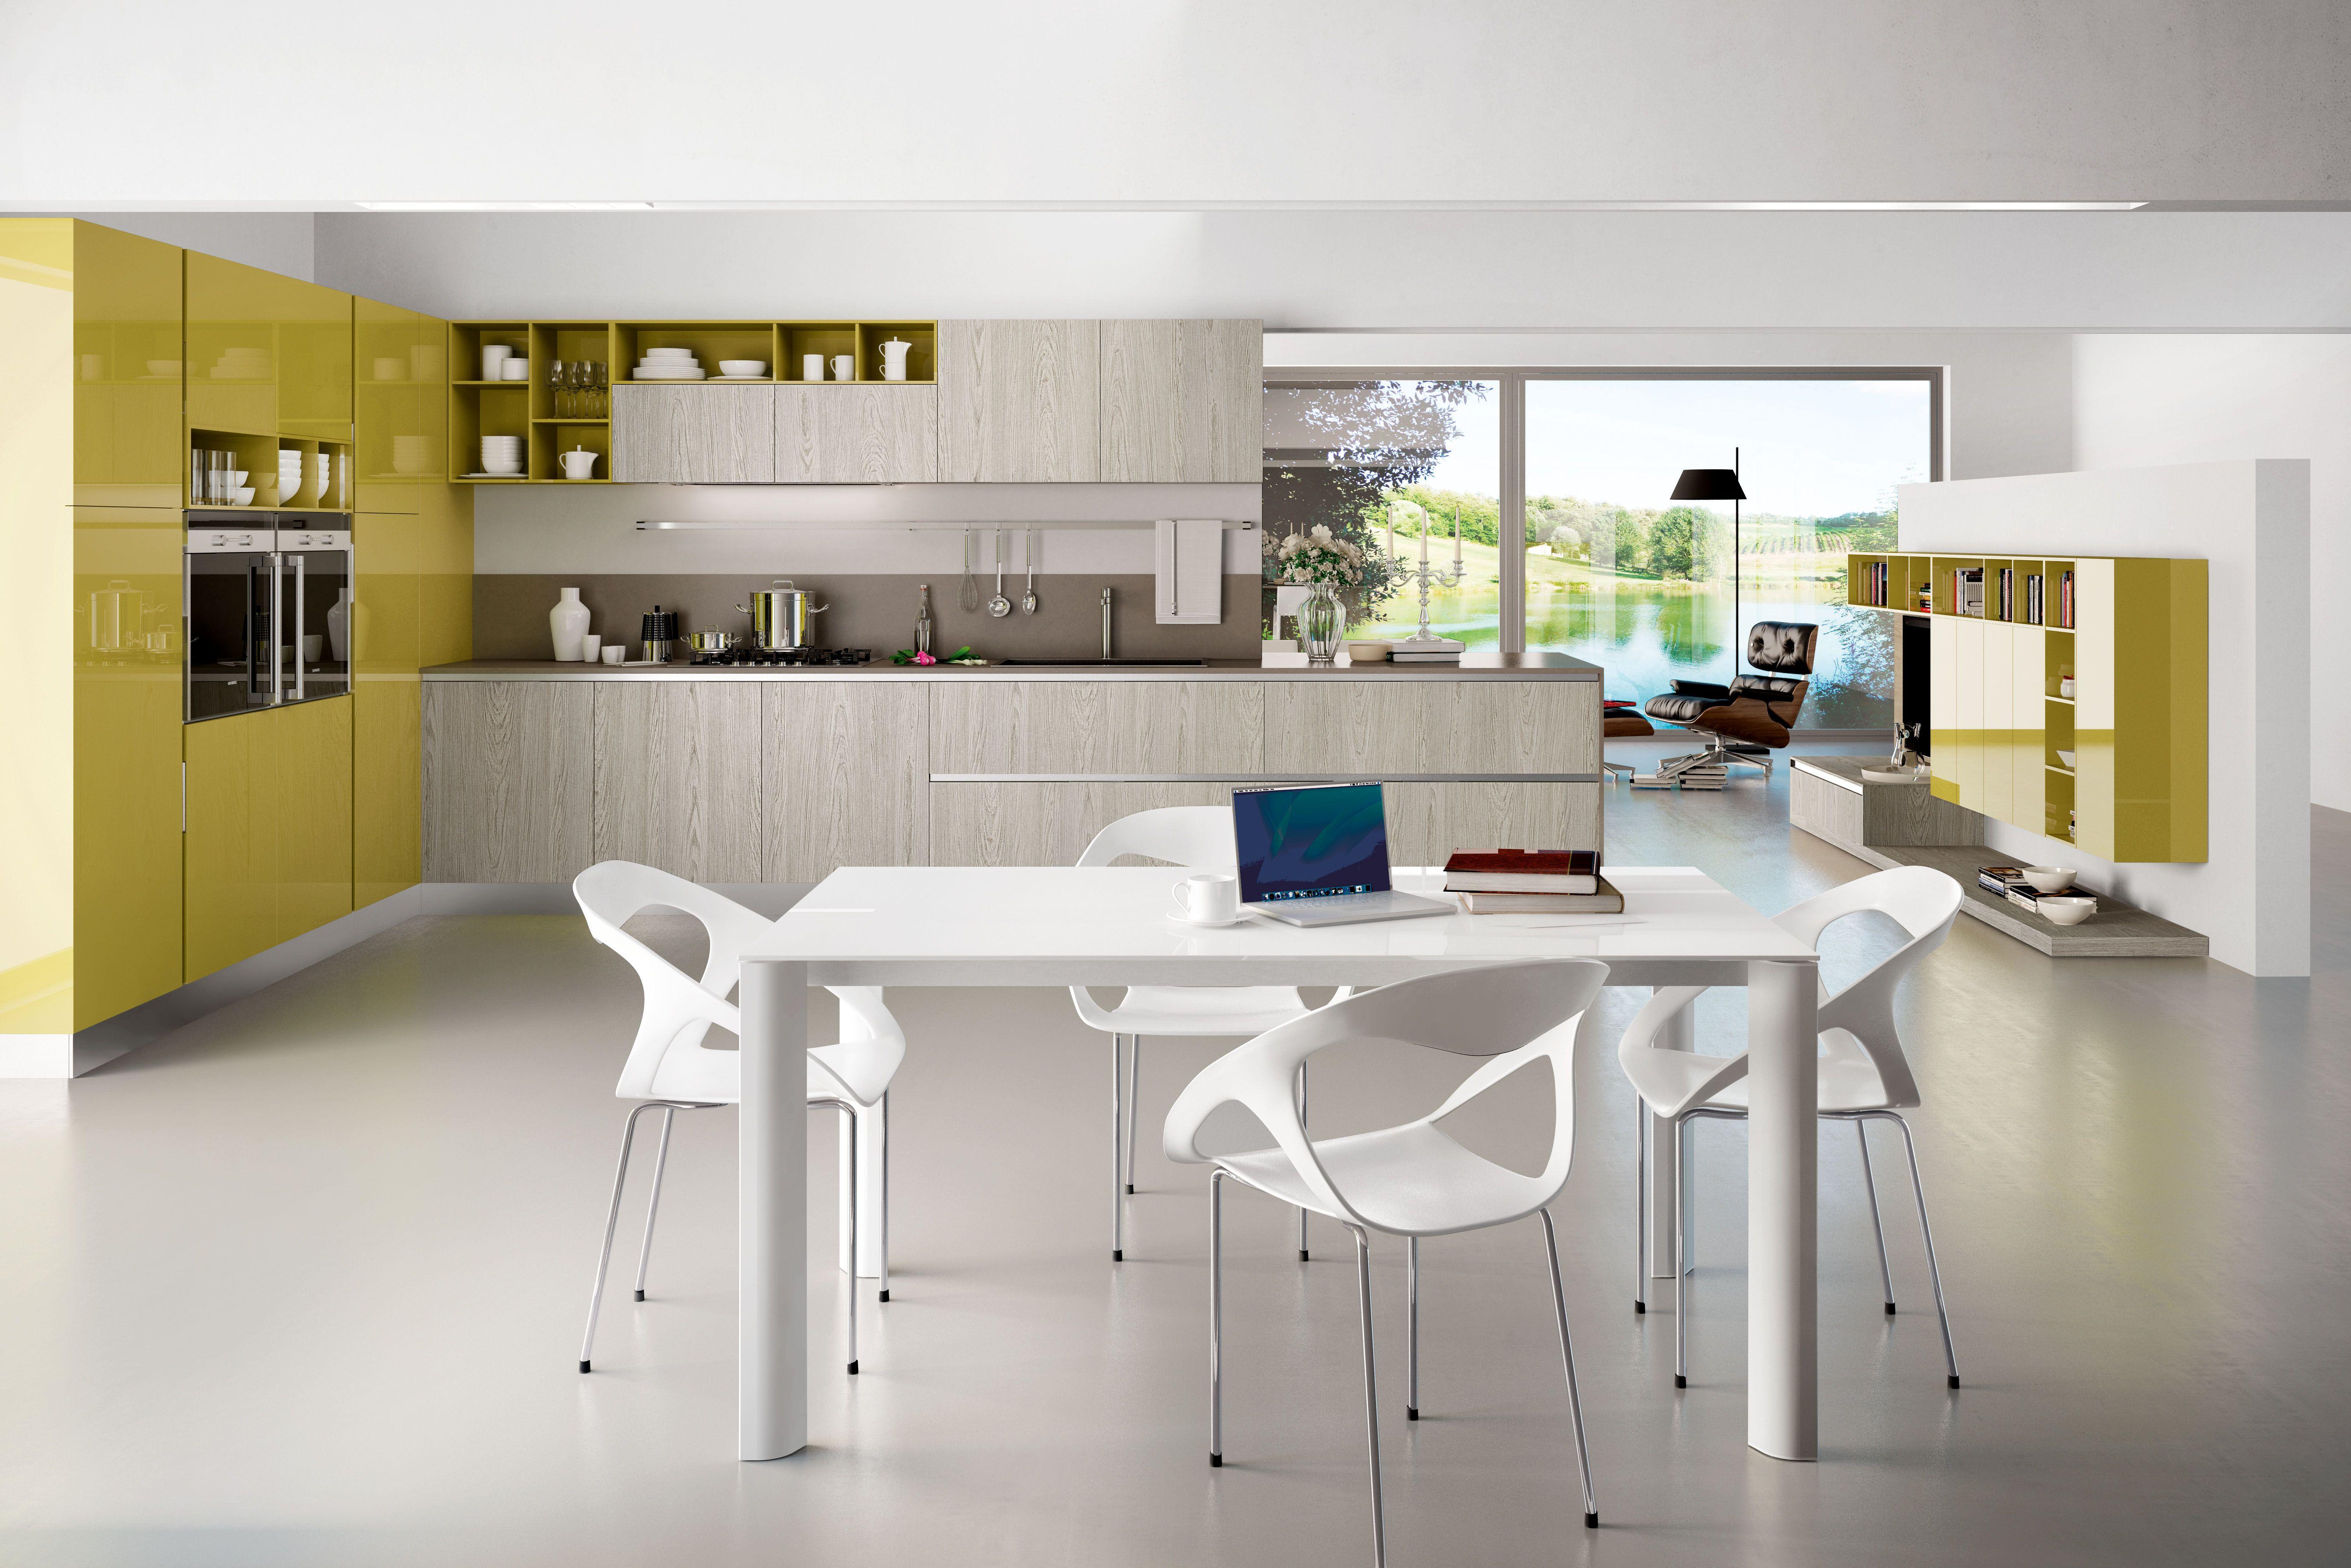 italian kitchen furniture. Explore Italian Kitchens, Modern Kitchens And More! Kitchen Furniture